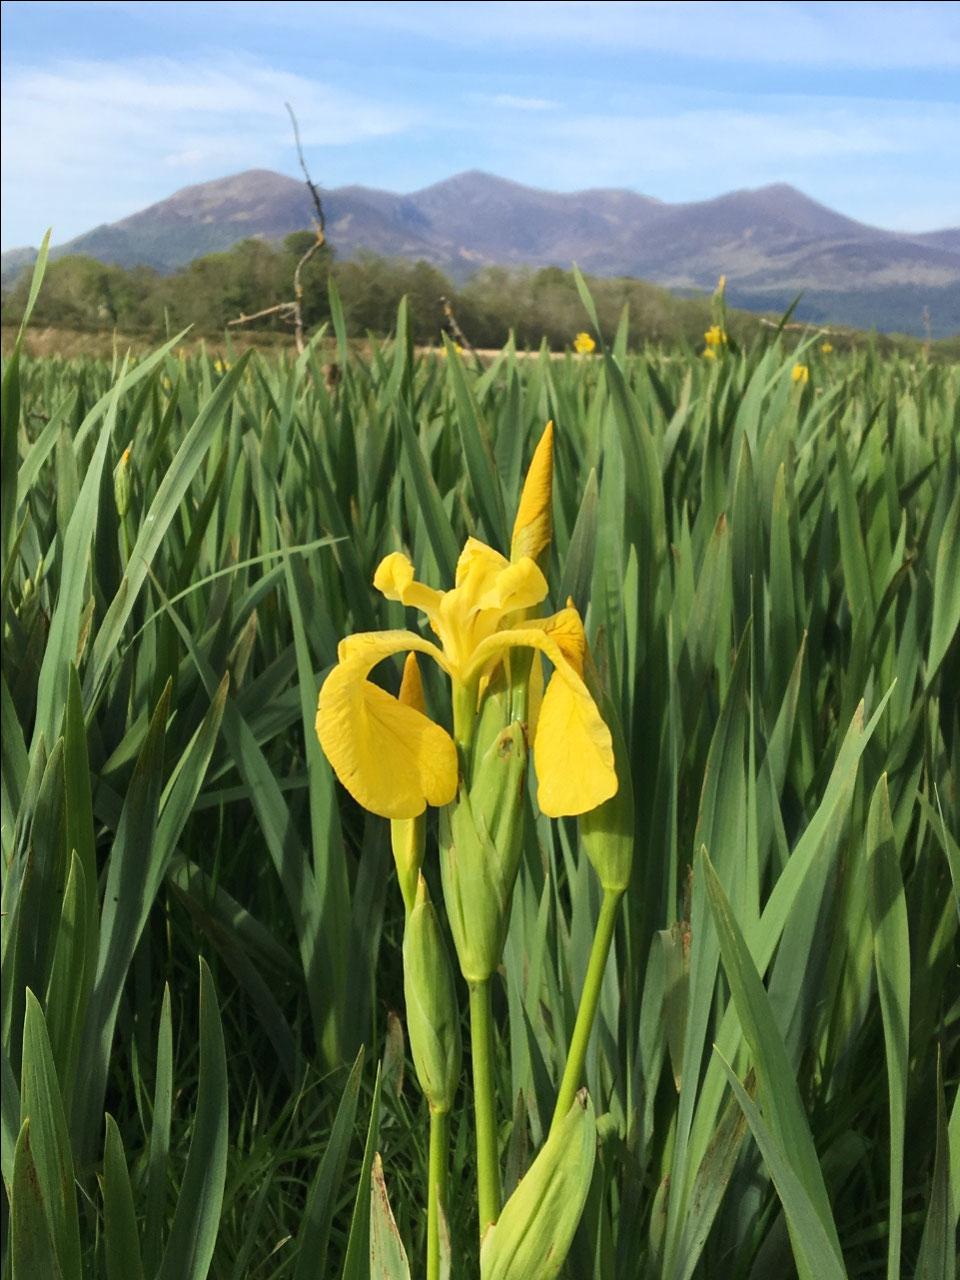 Wild Iris in the park